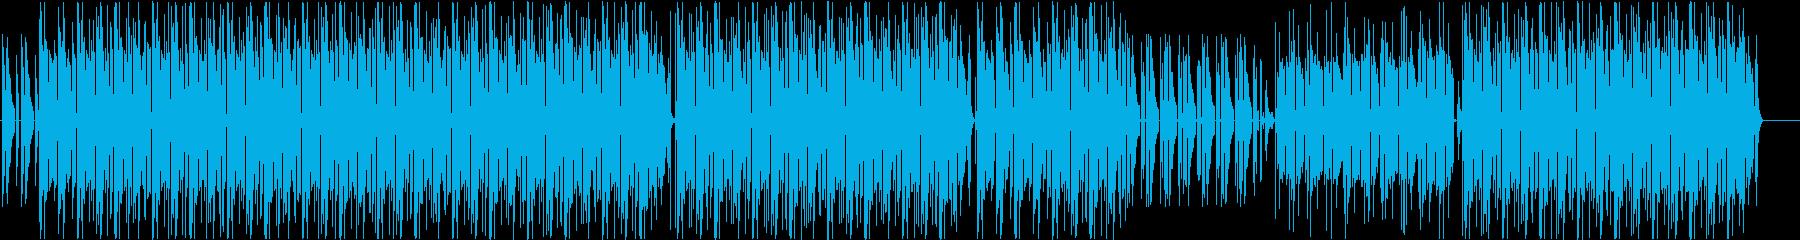 Lofi-style, calm and stylish sound's reproduced waveform